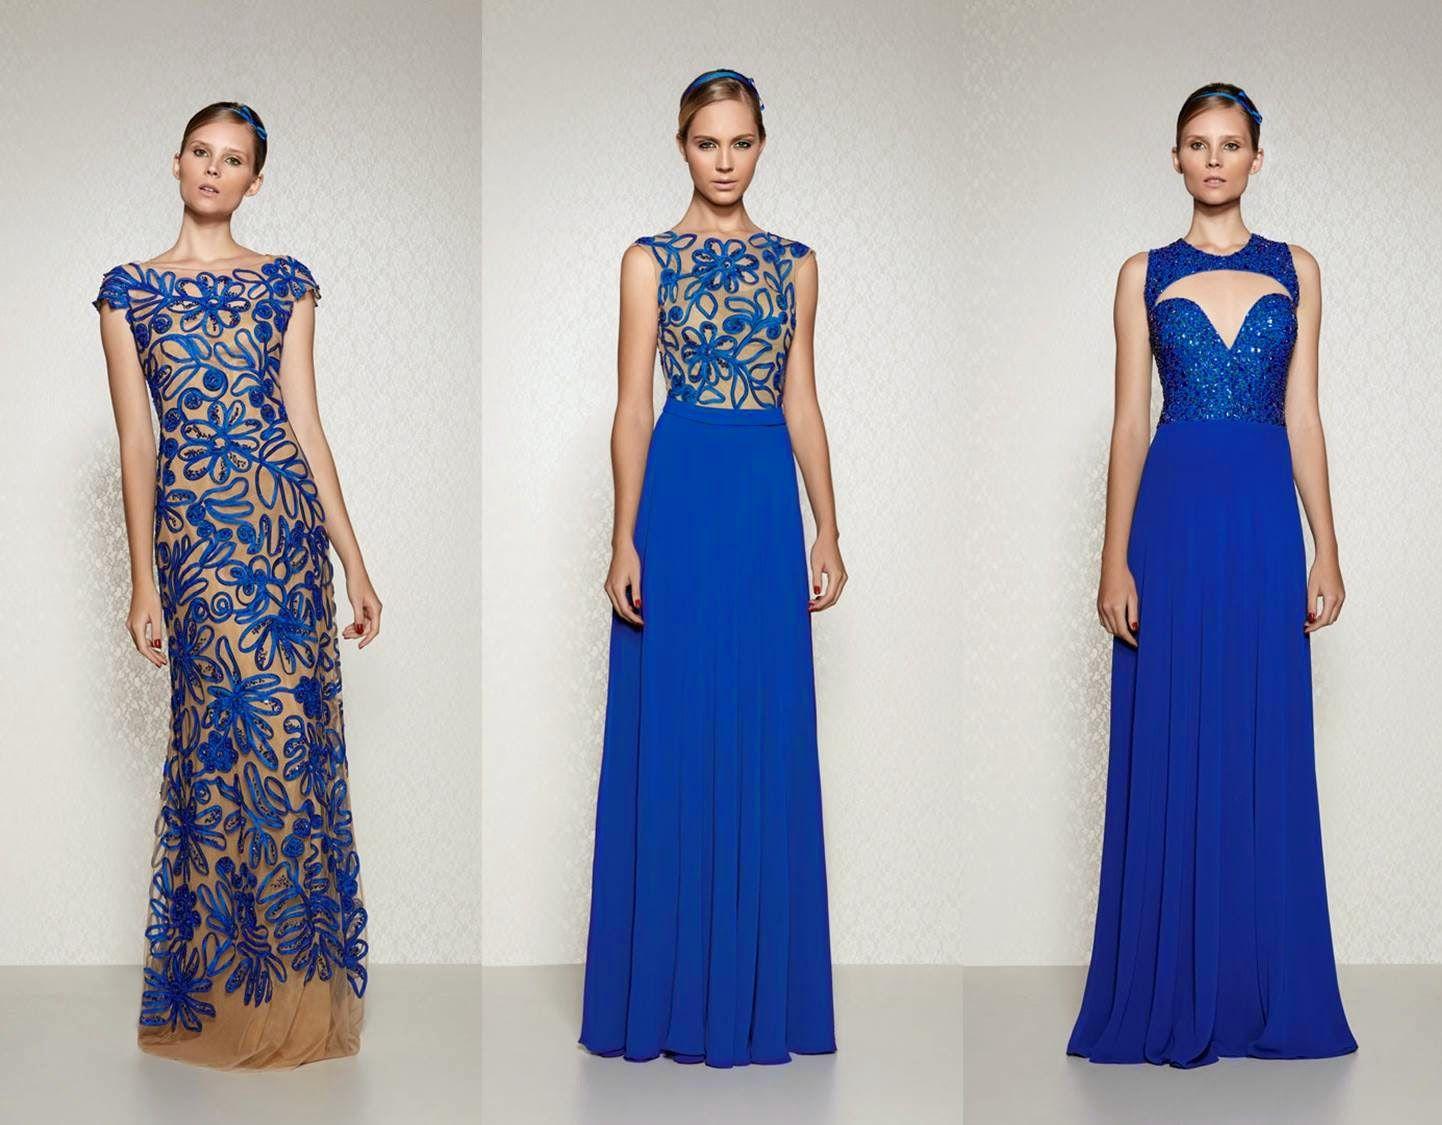 Vestido longo social azul